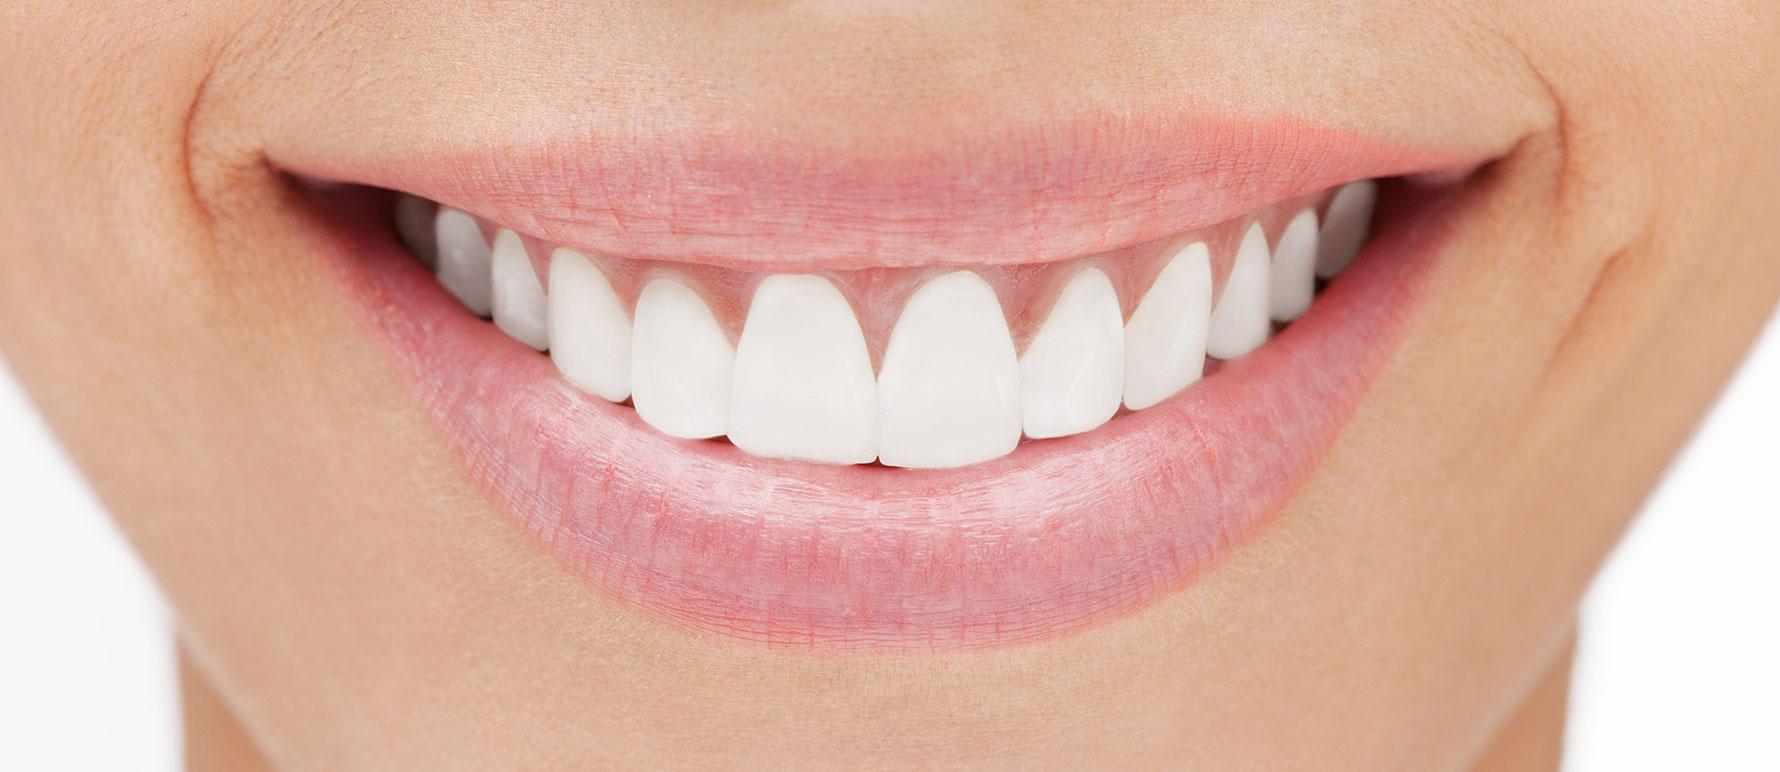 https://jamaicahospital.org/clinical-services/dental/